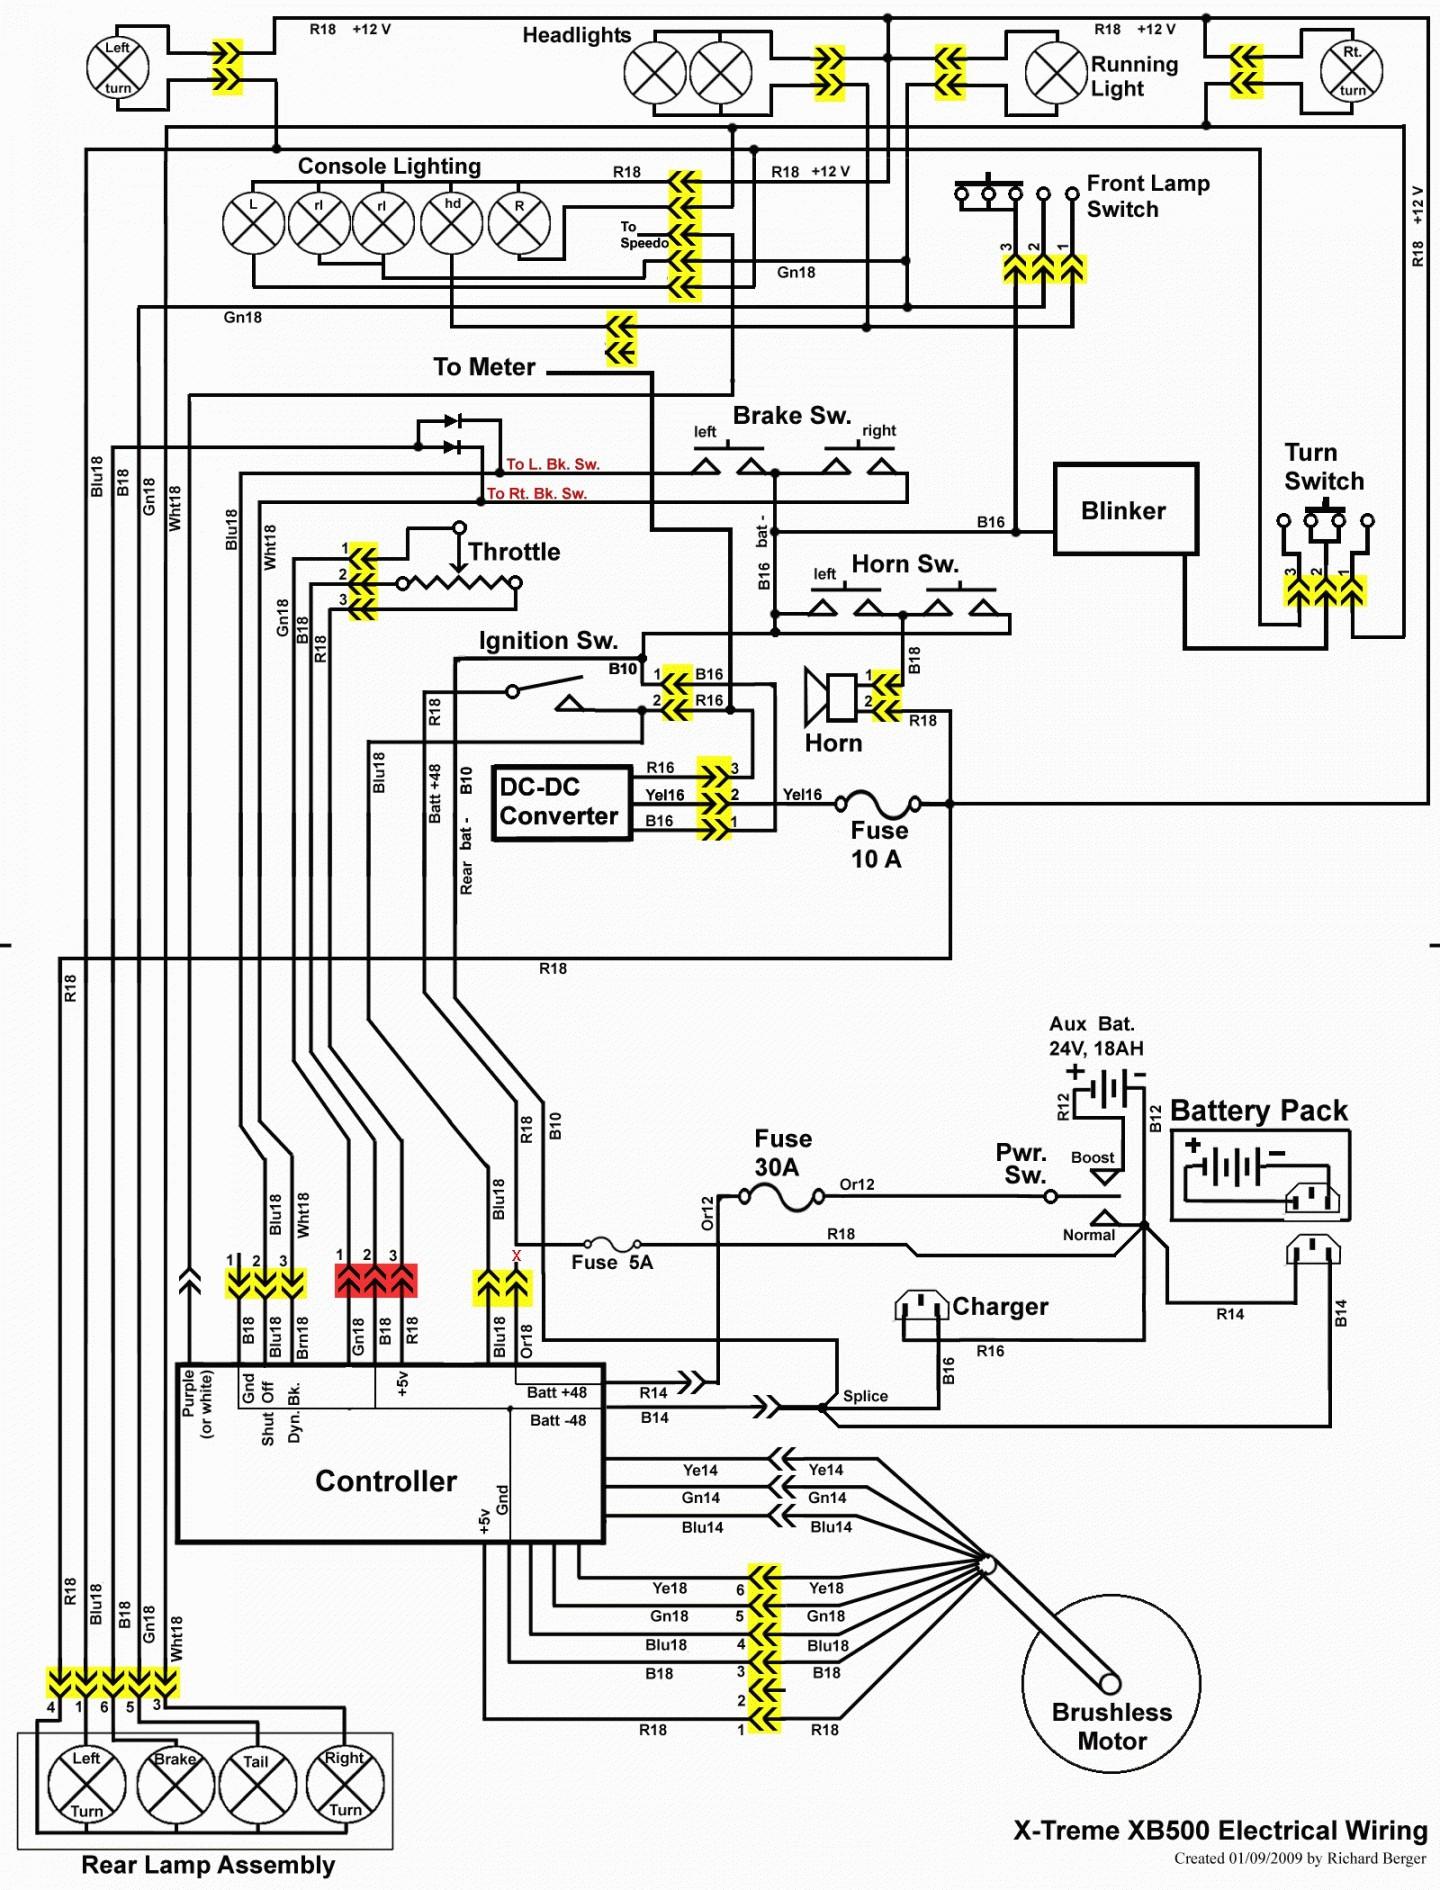 Verucci 150 Scooter Wiring Diagram | Wiring Diagram on cf moto wiring diagram, sinski wiring diagram, motofino wiring diagram, xingyue wiring diagram, sunl wiring diagram, garelli wiring diagram, victory wiring diagram, hyosung wiring diagram, kawasaki wiring diagram, redcat wiring diagram, nst wiring diagram, ducati wiring diagram, coolster wiring diagram, honda wiring diagram, the trike shop wiring diagram, tomos wiring diagram, kasea wiring diagram, alpha sports wiring diagram, baja wiring diagram, ktm wiring diagram,